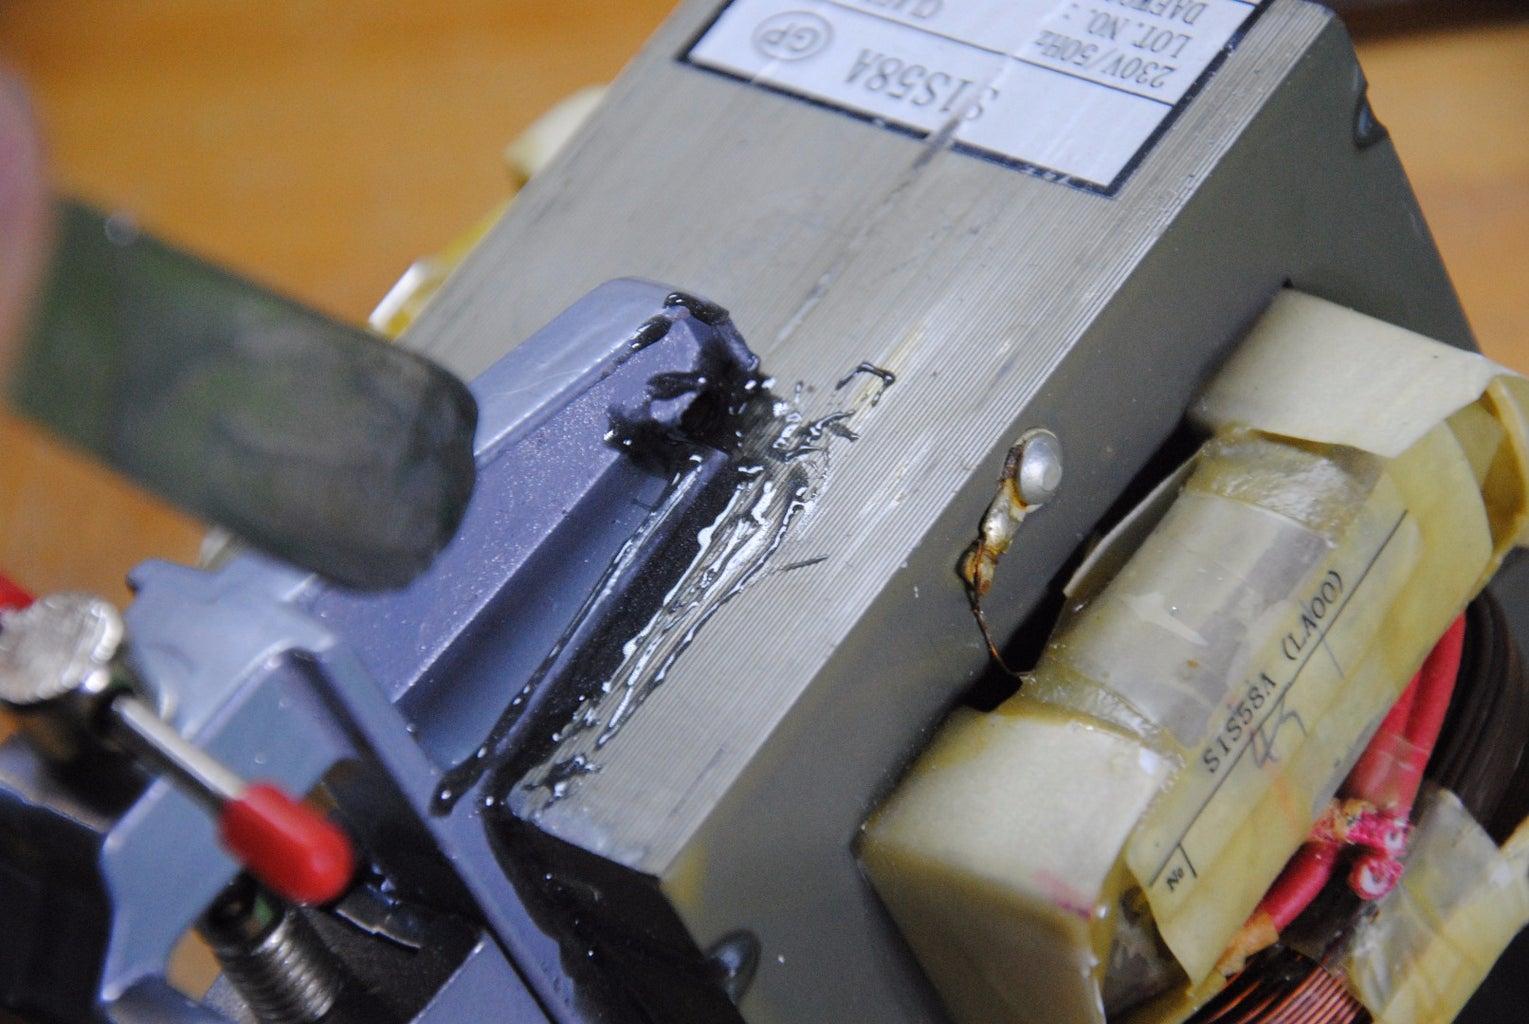 Glue the Vise to the Transformer W/ Epoxy